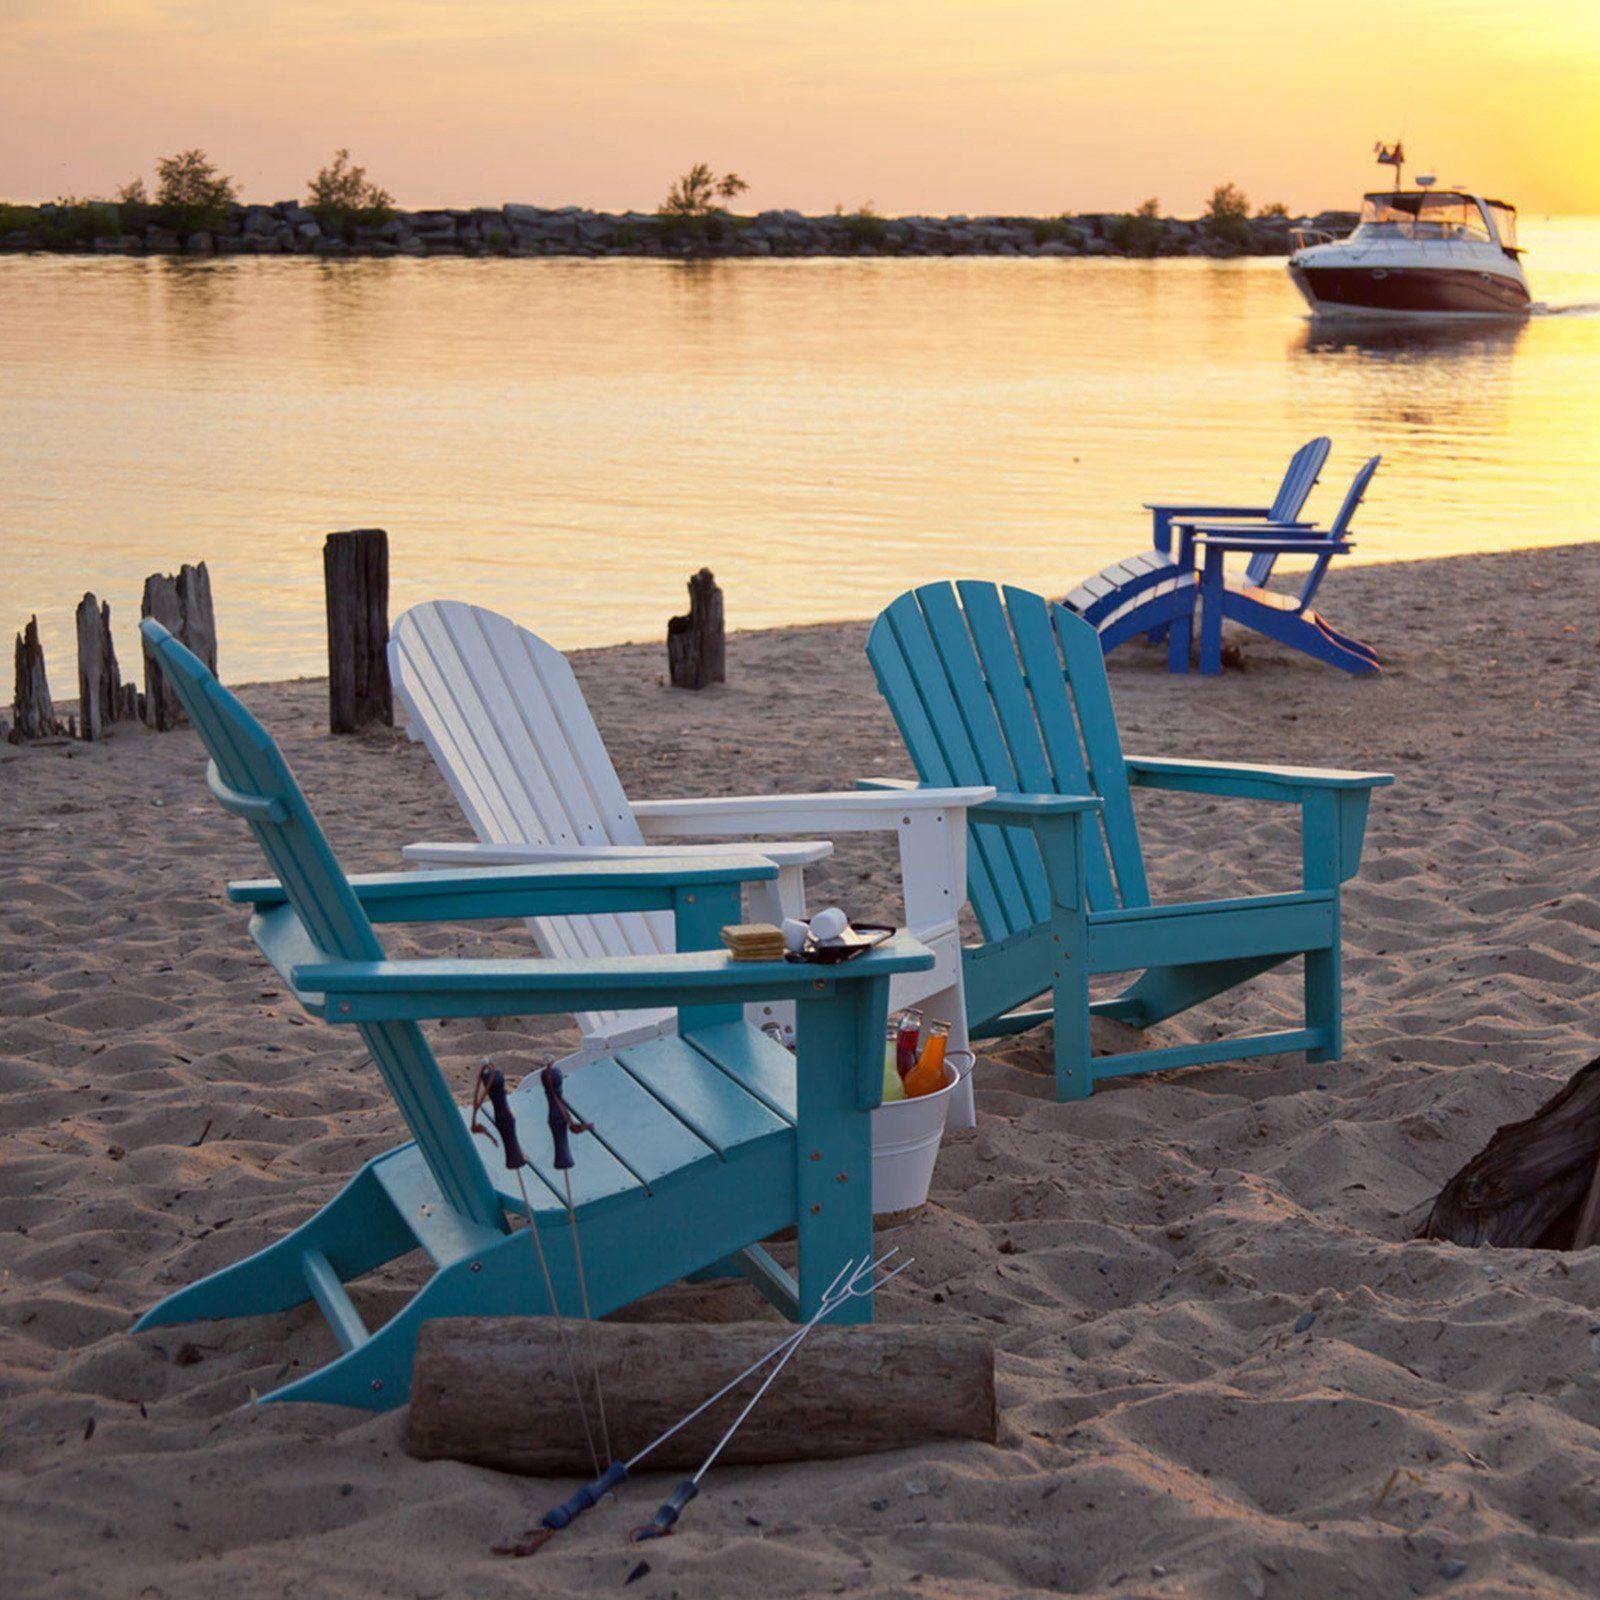 POLYWOOD® South Beach Recycled Plastic Adirondack Chair   Adirondack Chairs  At Hayneedle